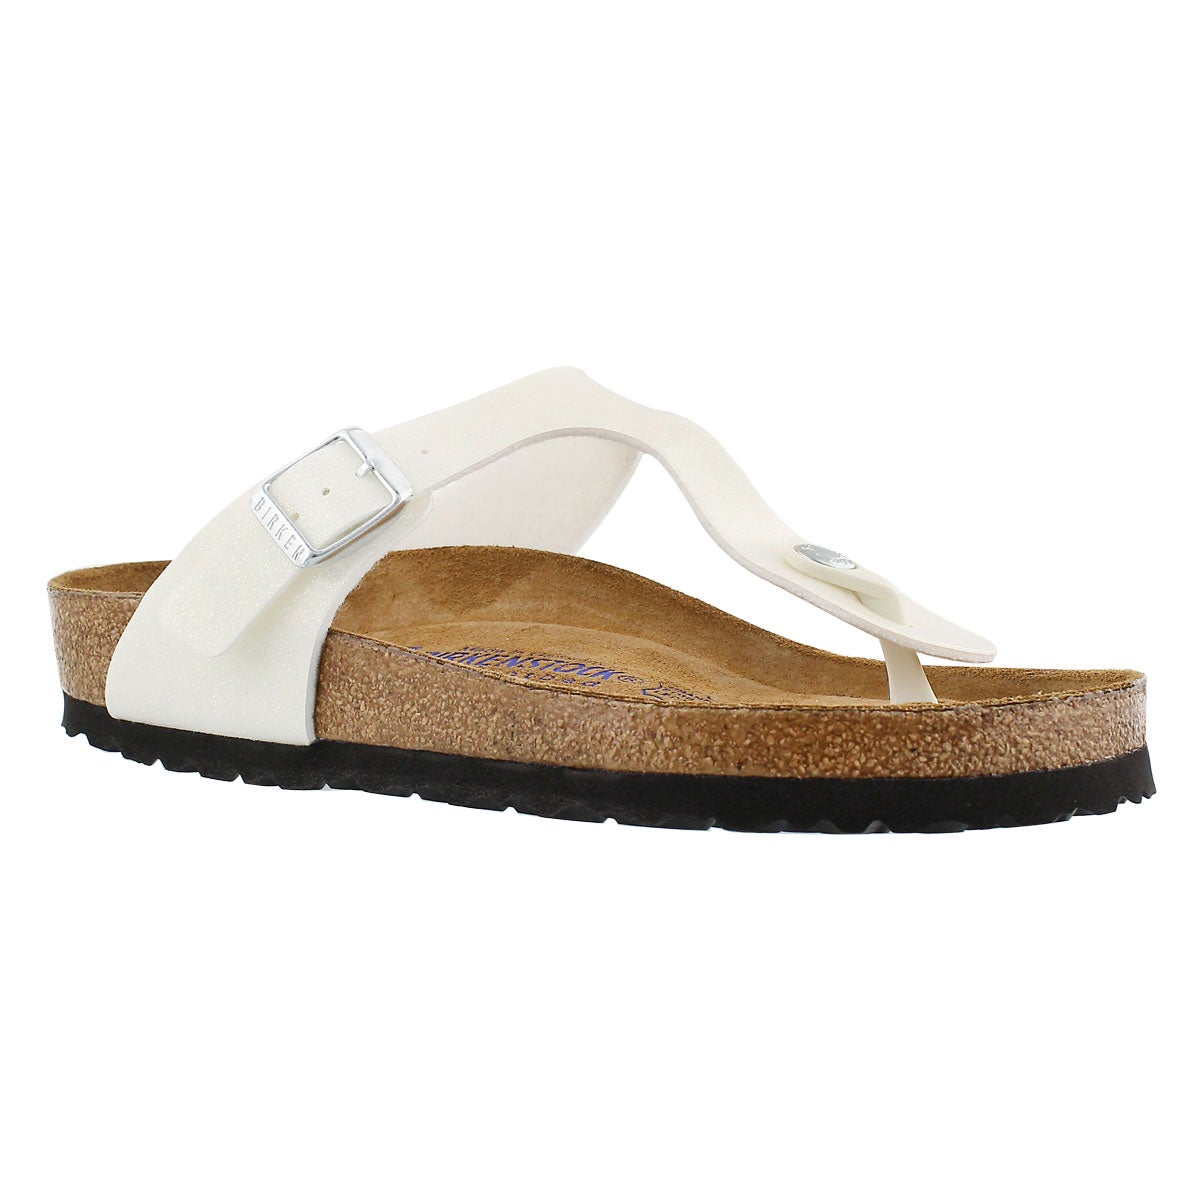 Lds Gizeh SF magic galaxy wht sandal